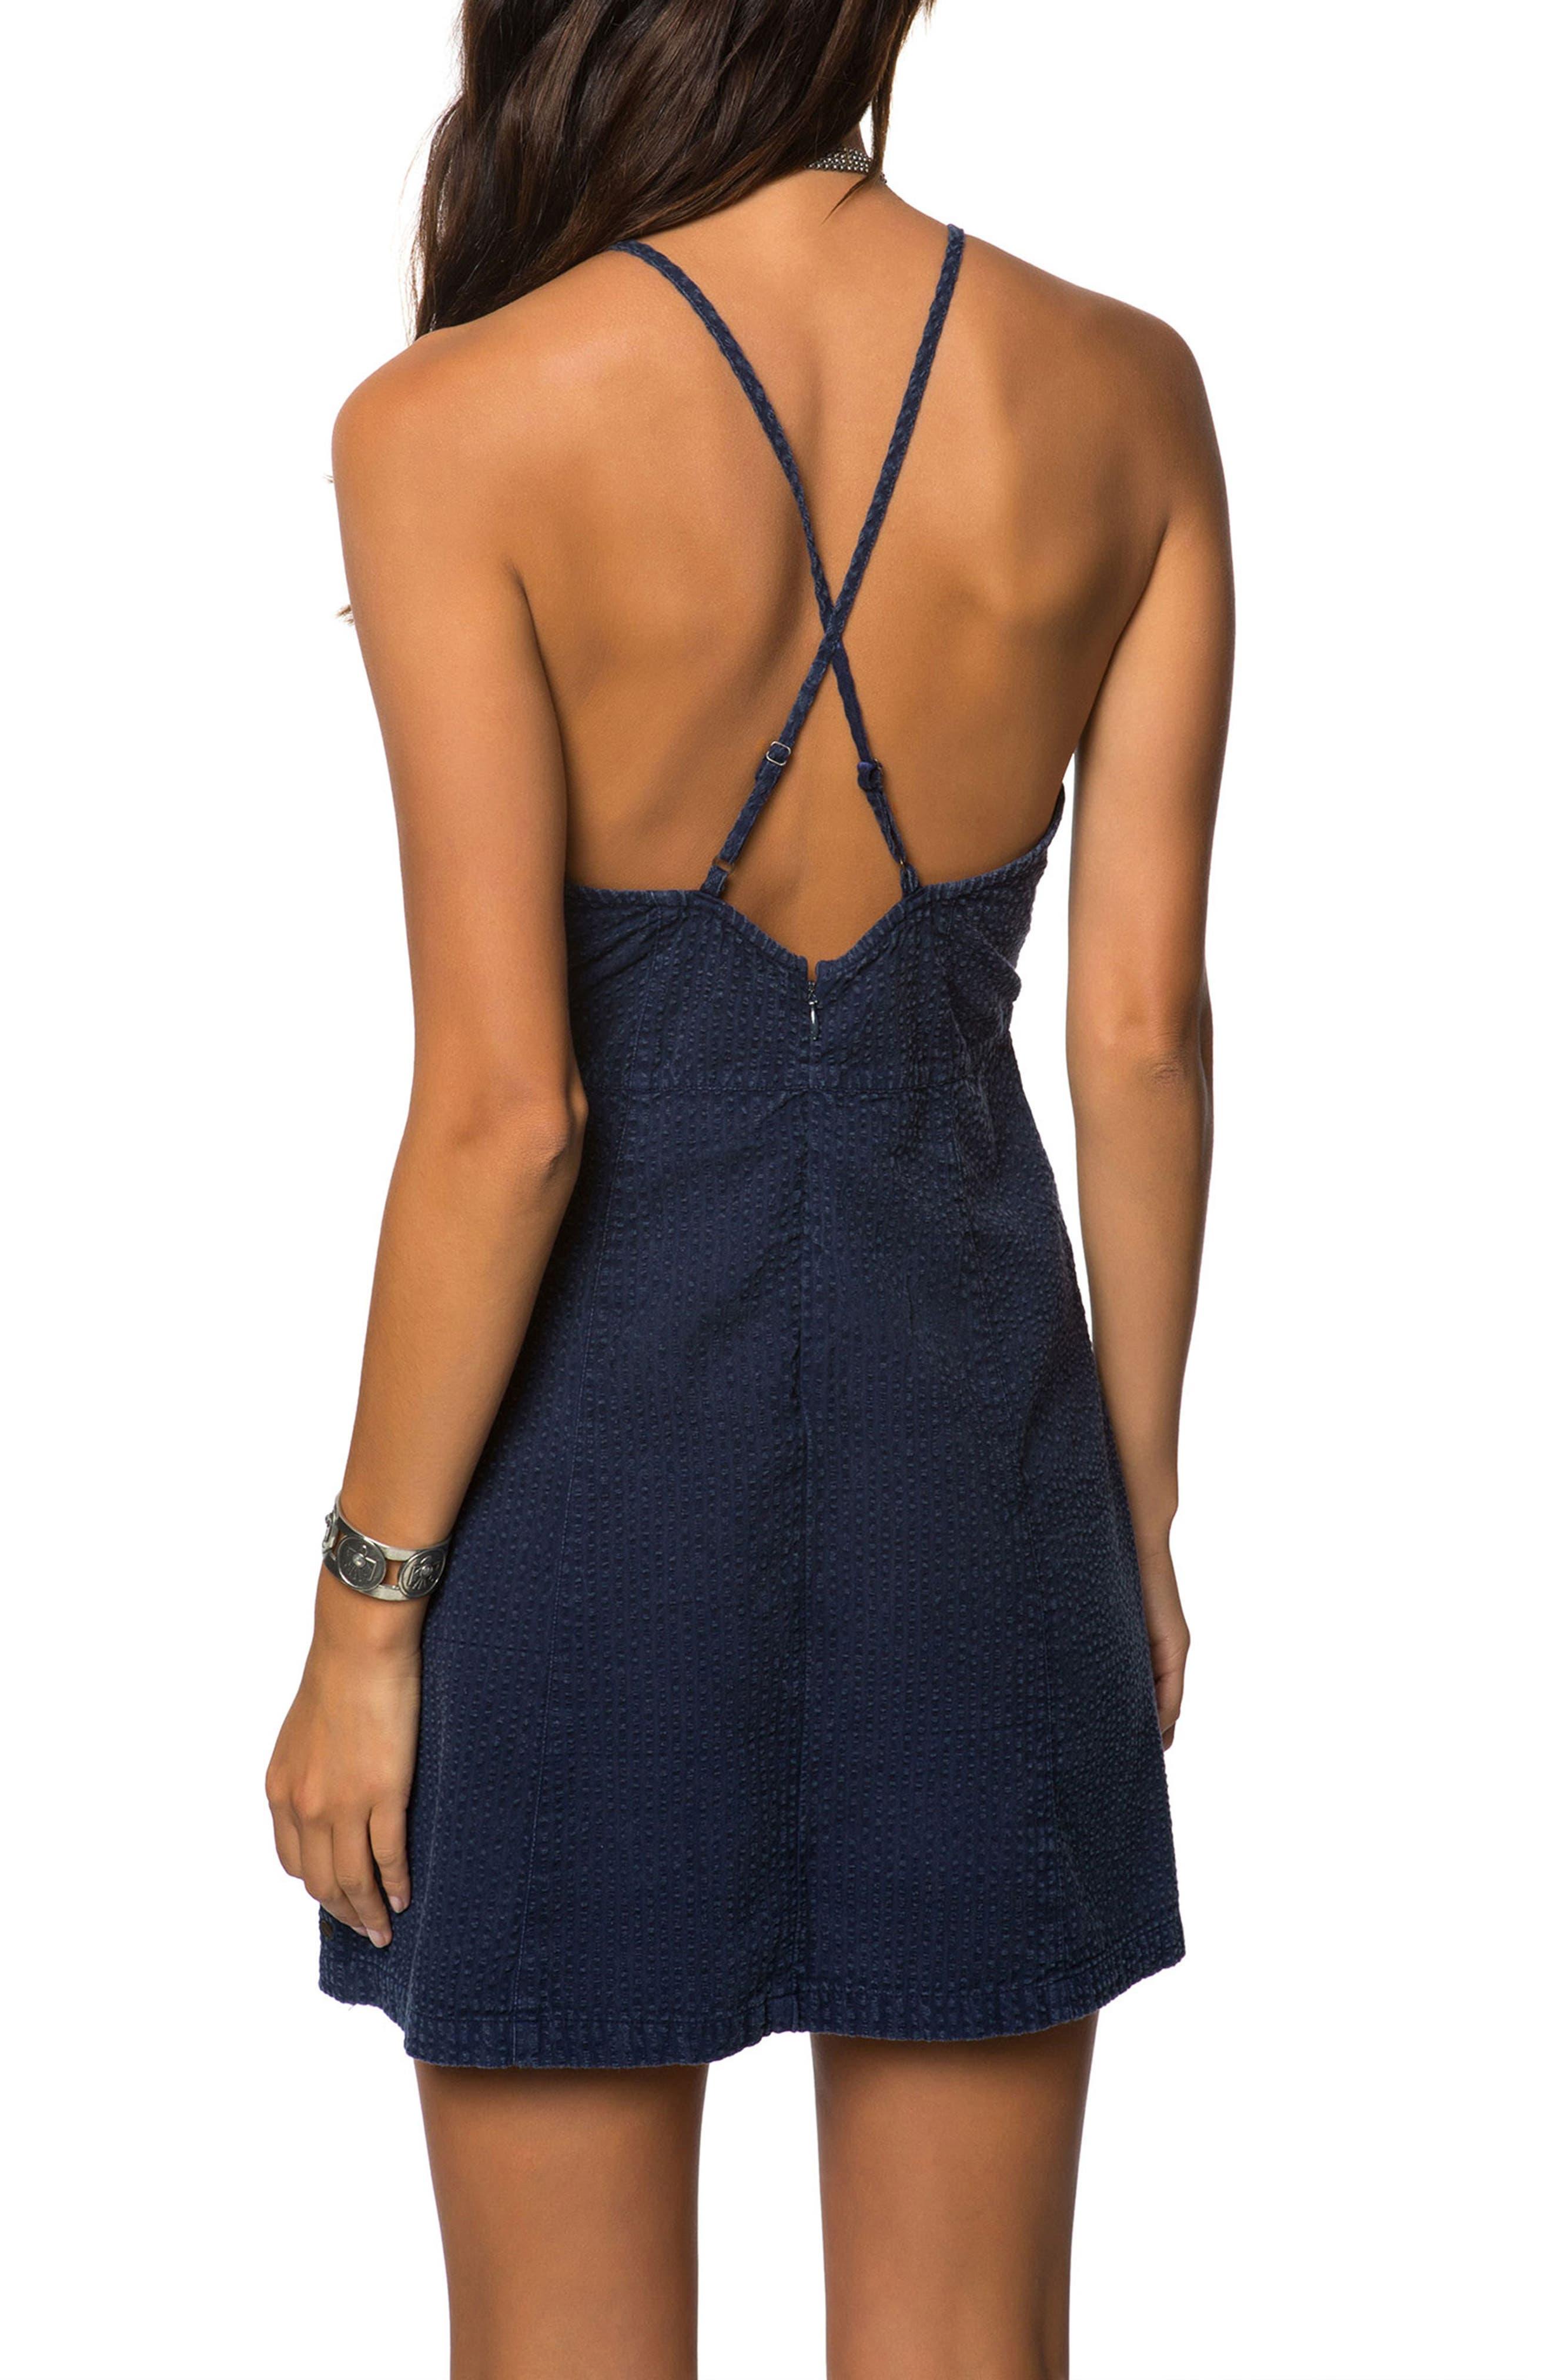 Esme Seersucker Apron Dress,                             Alternate thumbnail 2, color,                             Evening Blue